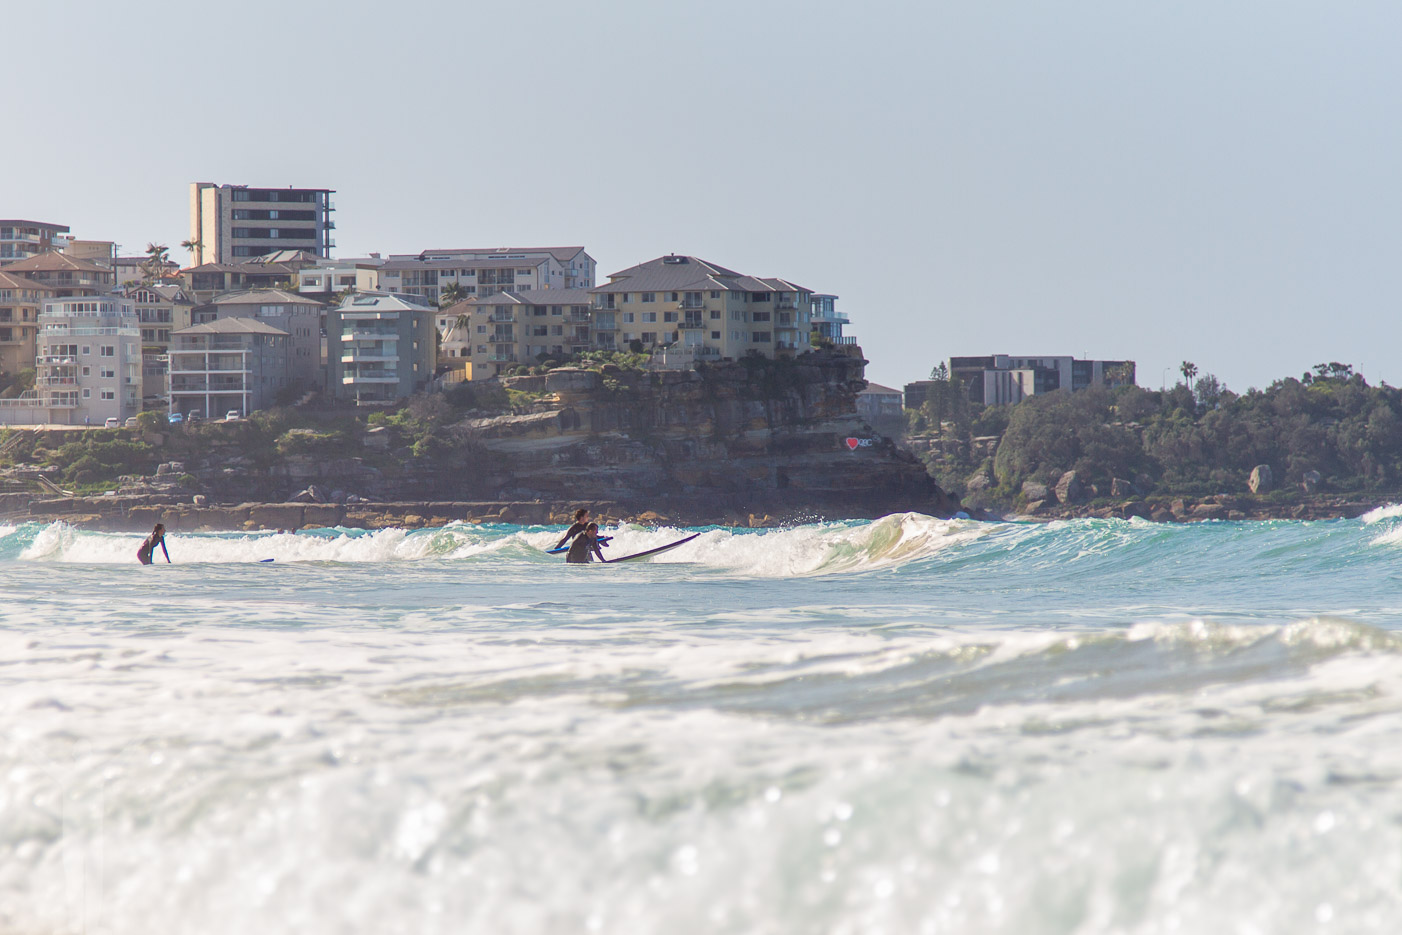 Manly Beach utanför Sydney